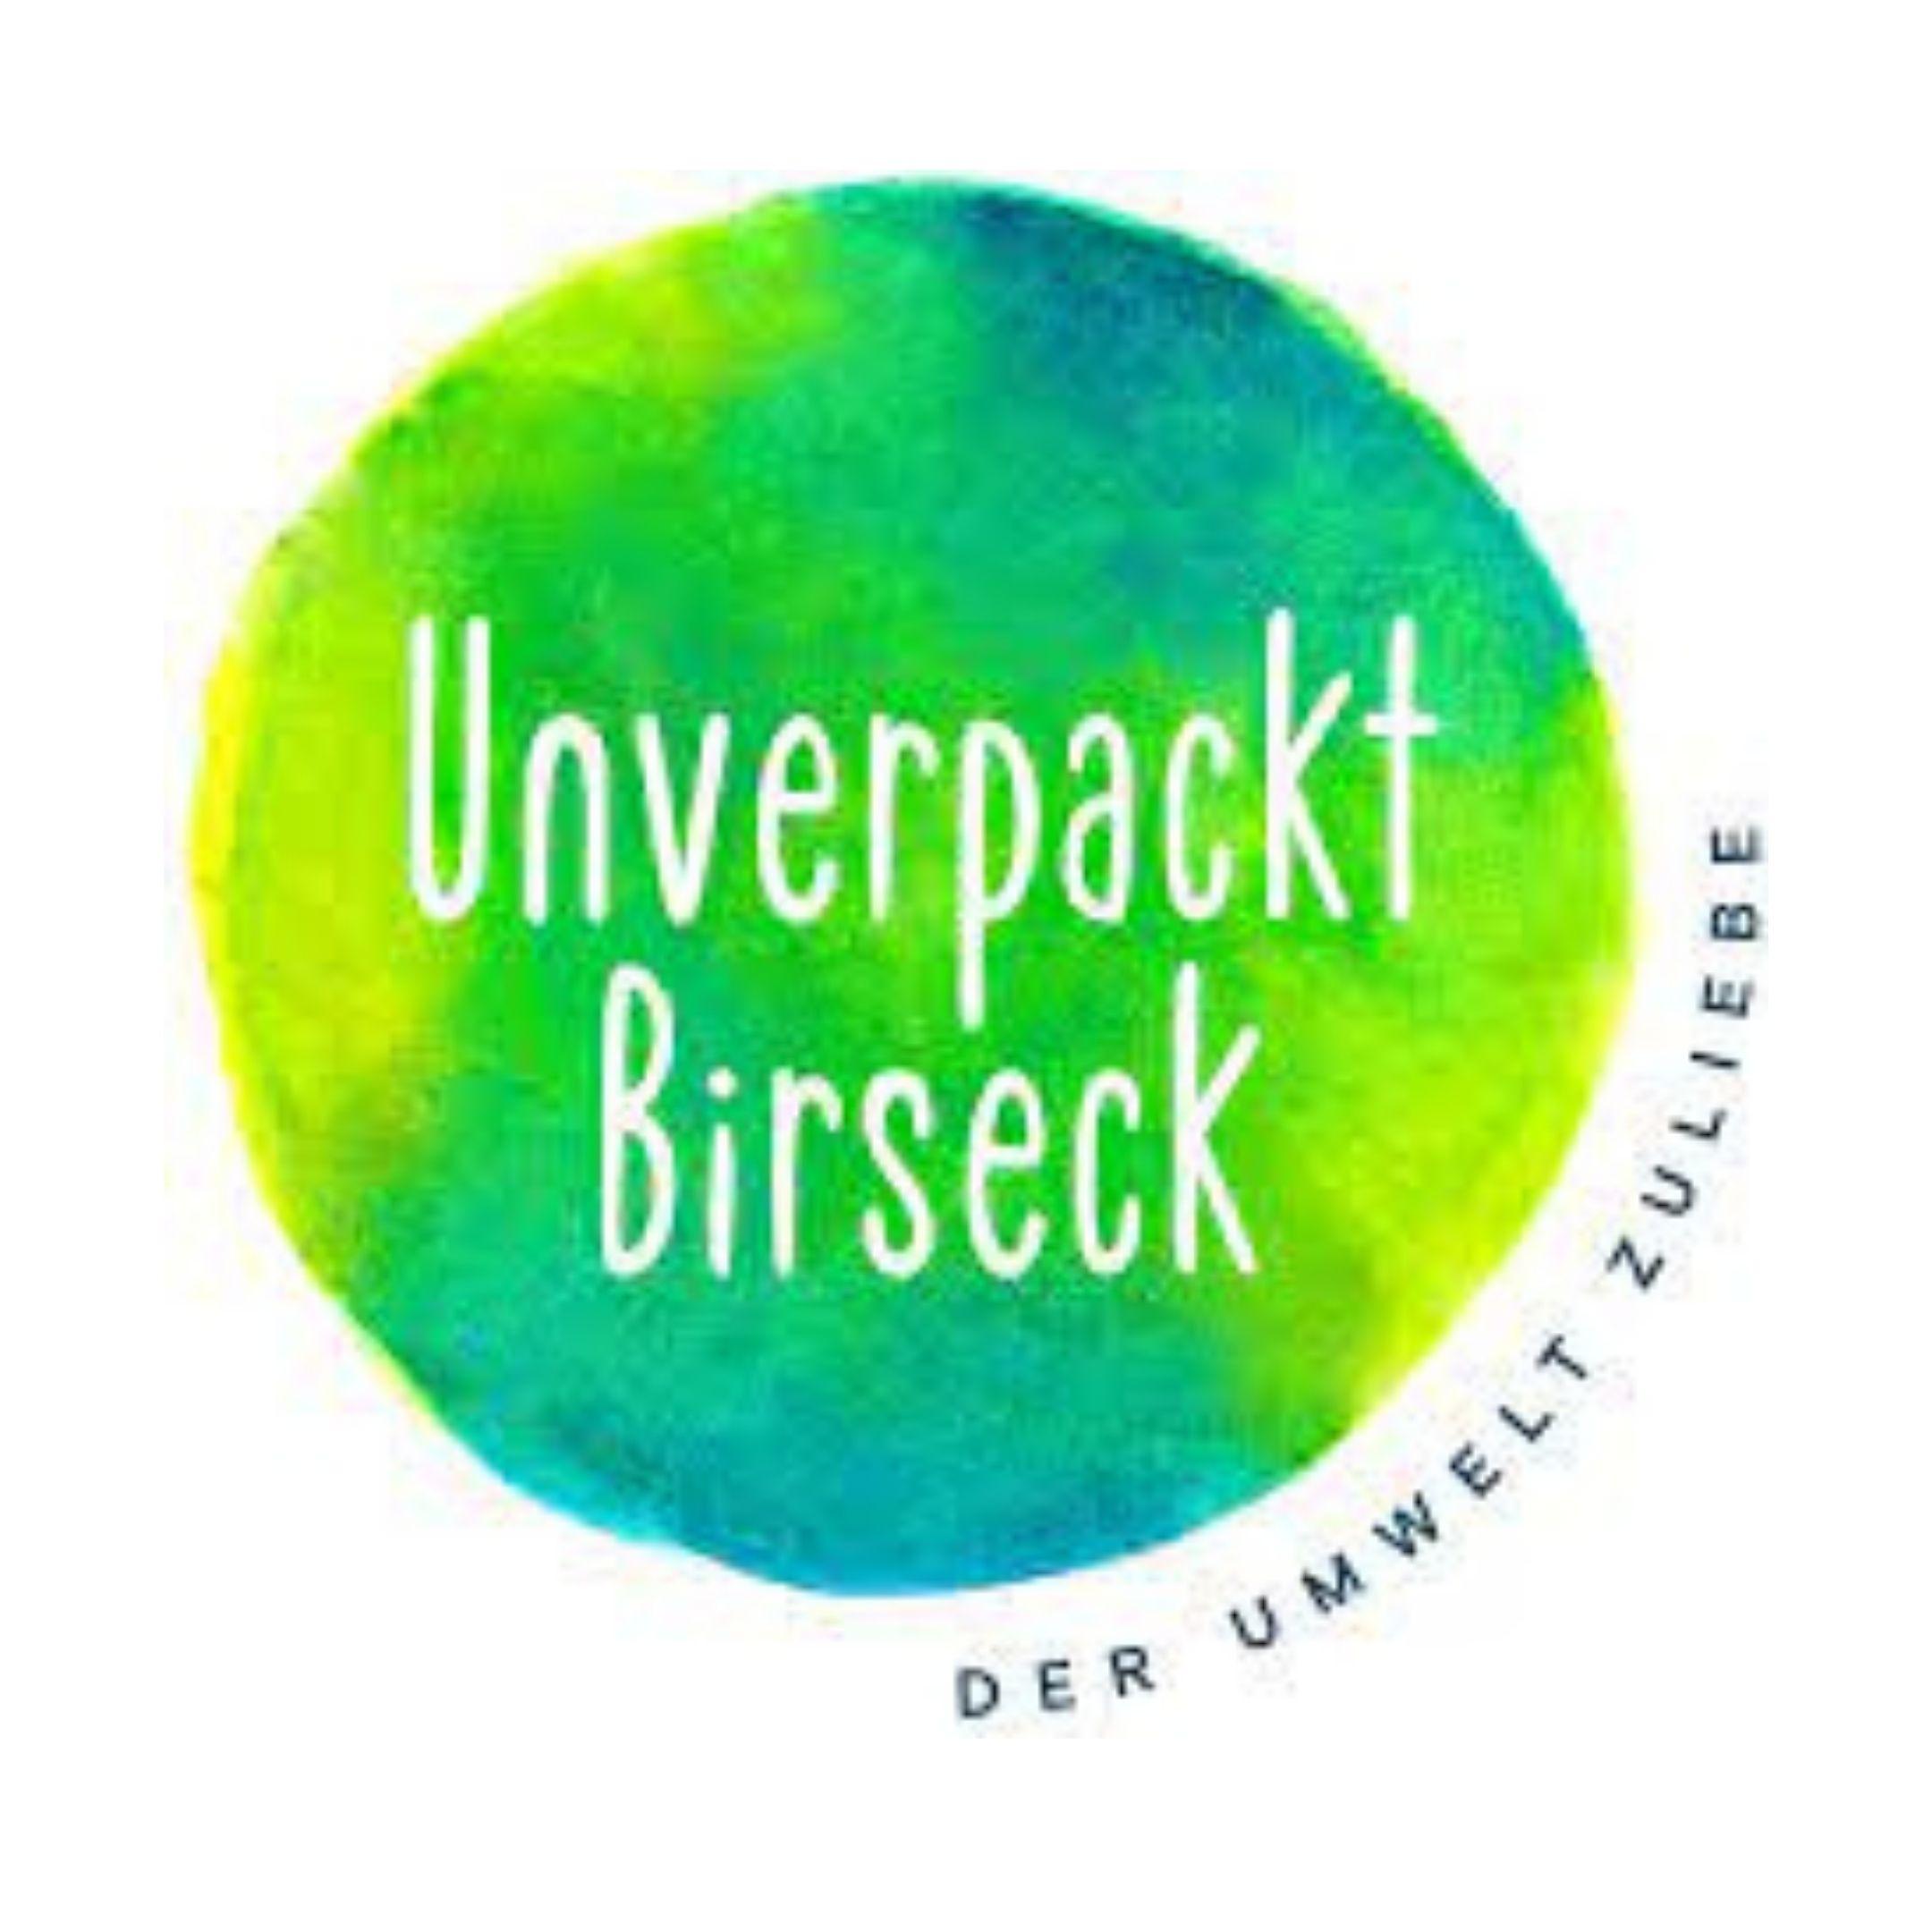 unverpackt Birseck